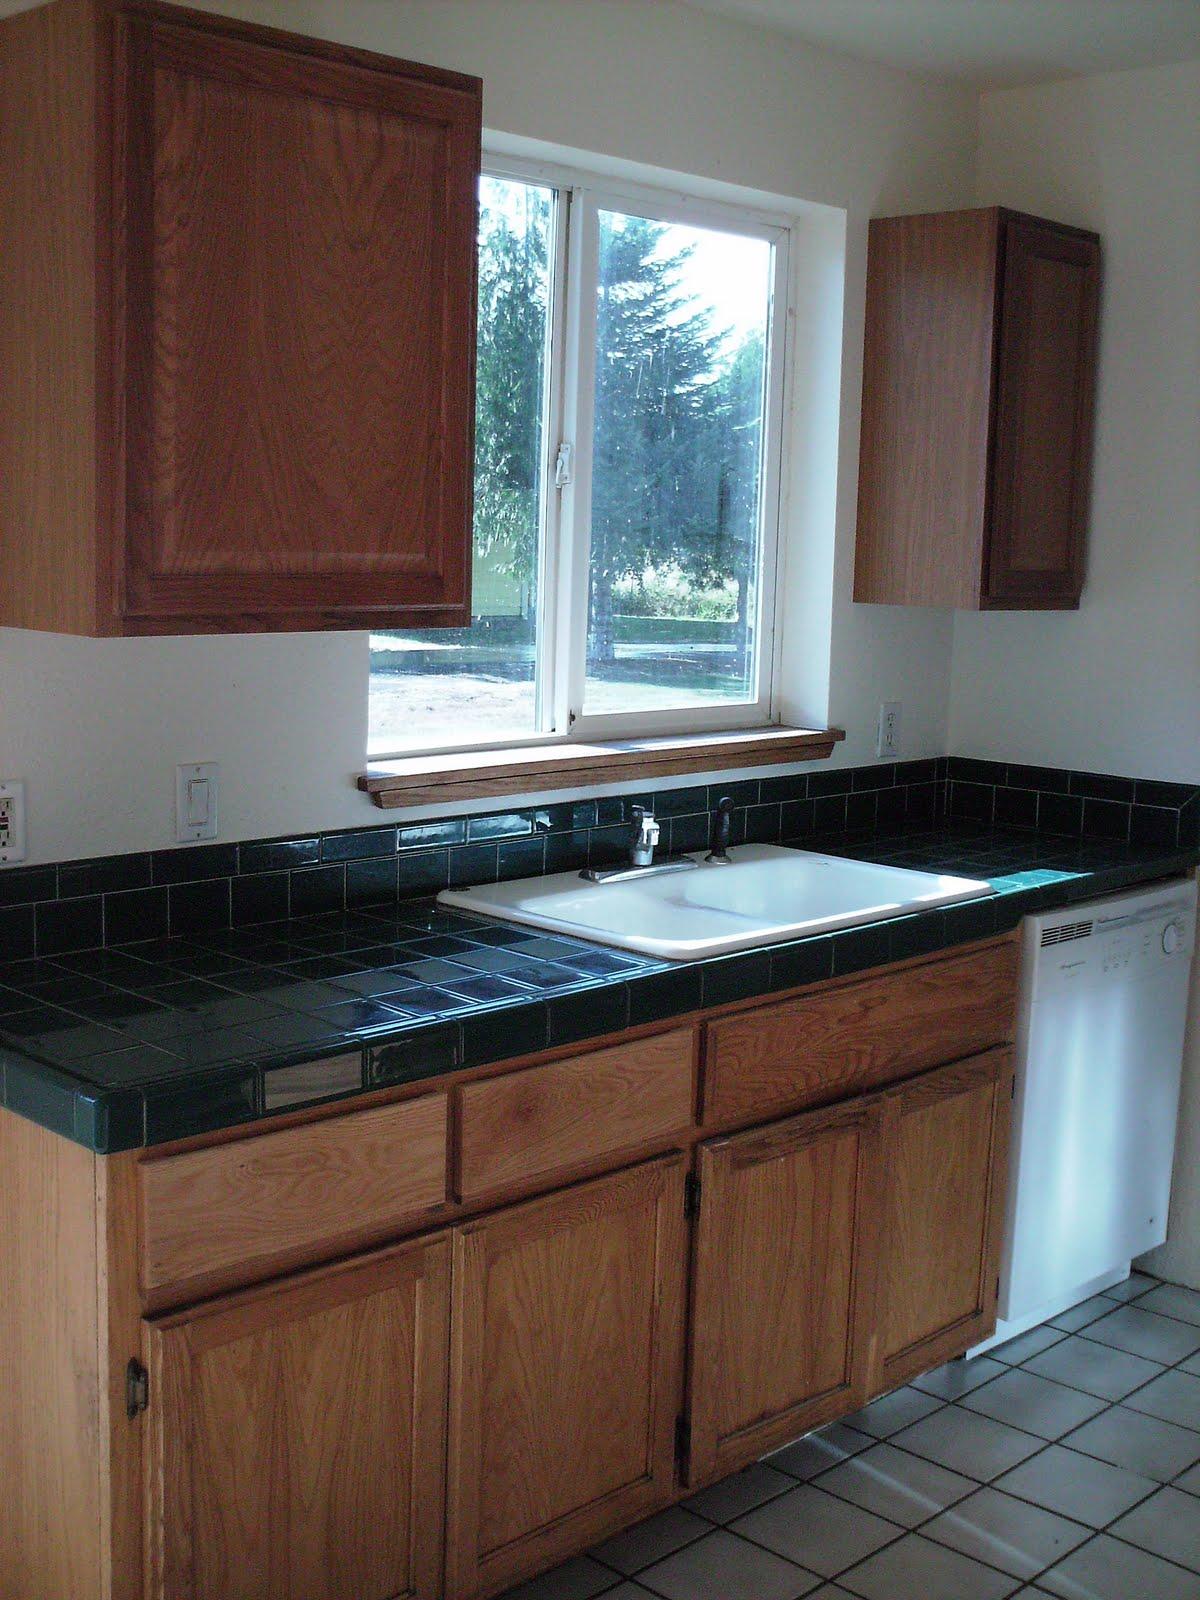 Real Estate Information Still Available 3 Bedrm 2 Ba Home